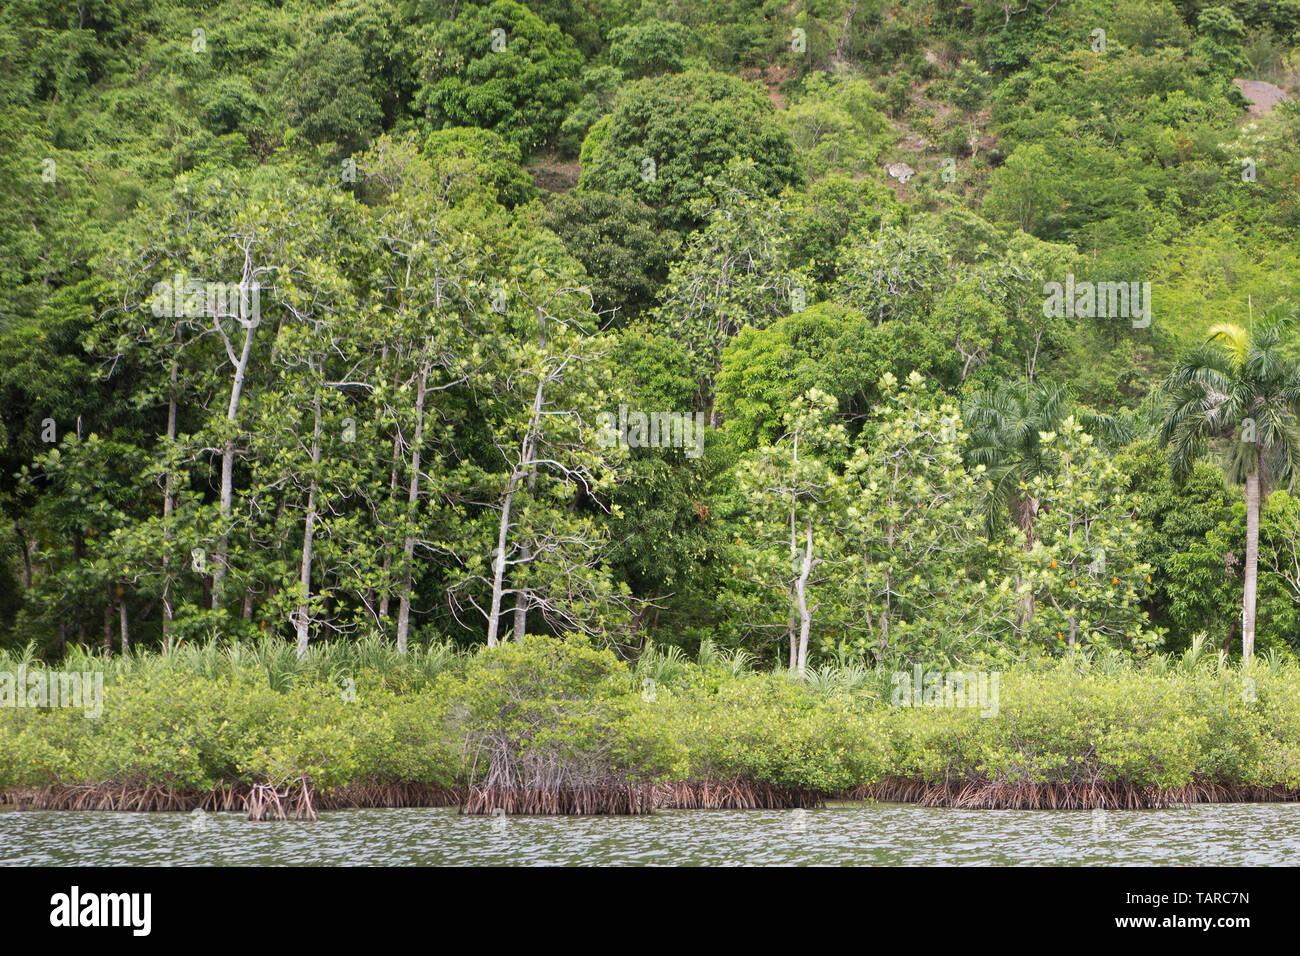 Haiti, hispaniola island, Haiti landscape - Stock Image